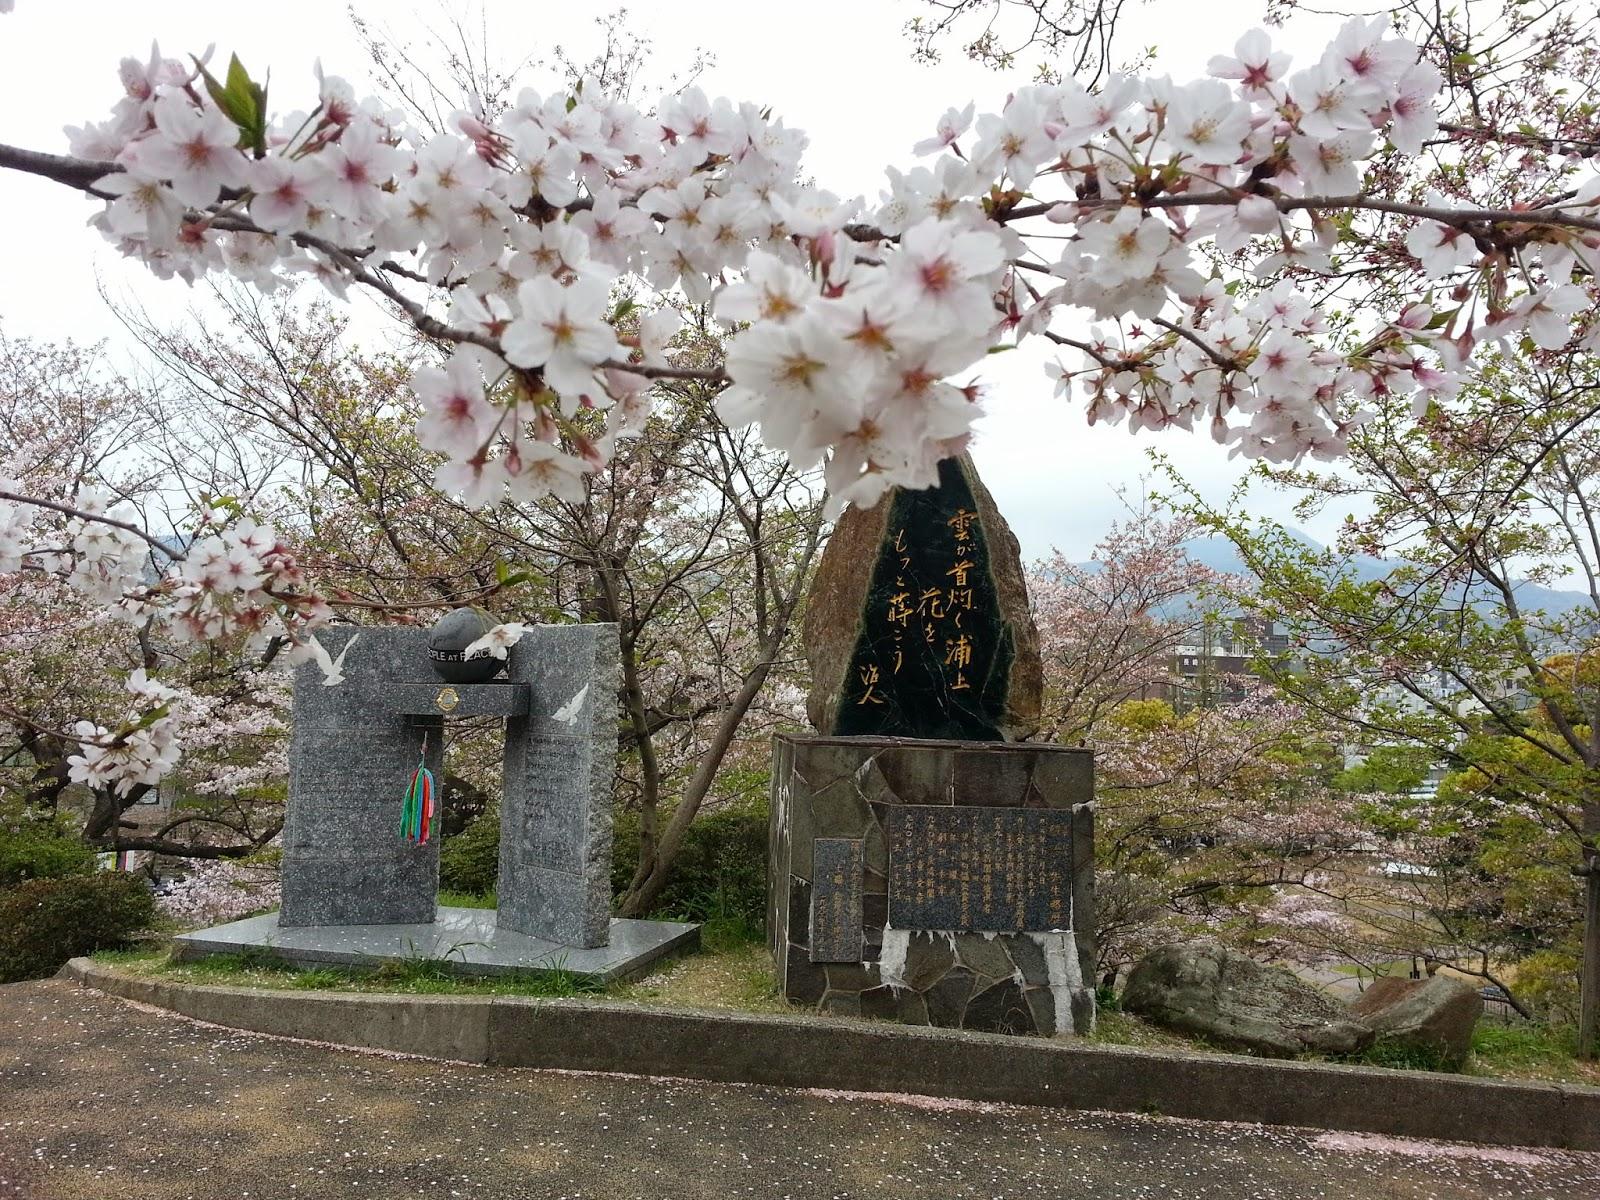 Twilight Zone: Atomic Bomb Museum - Nagasaki